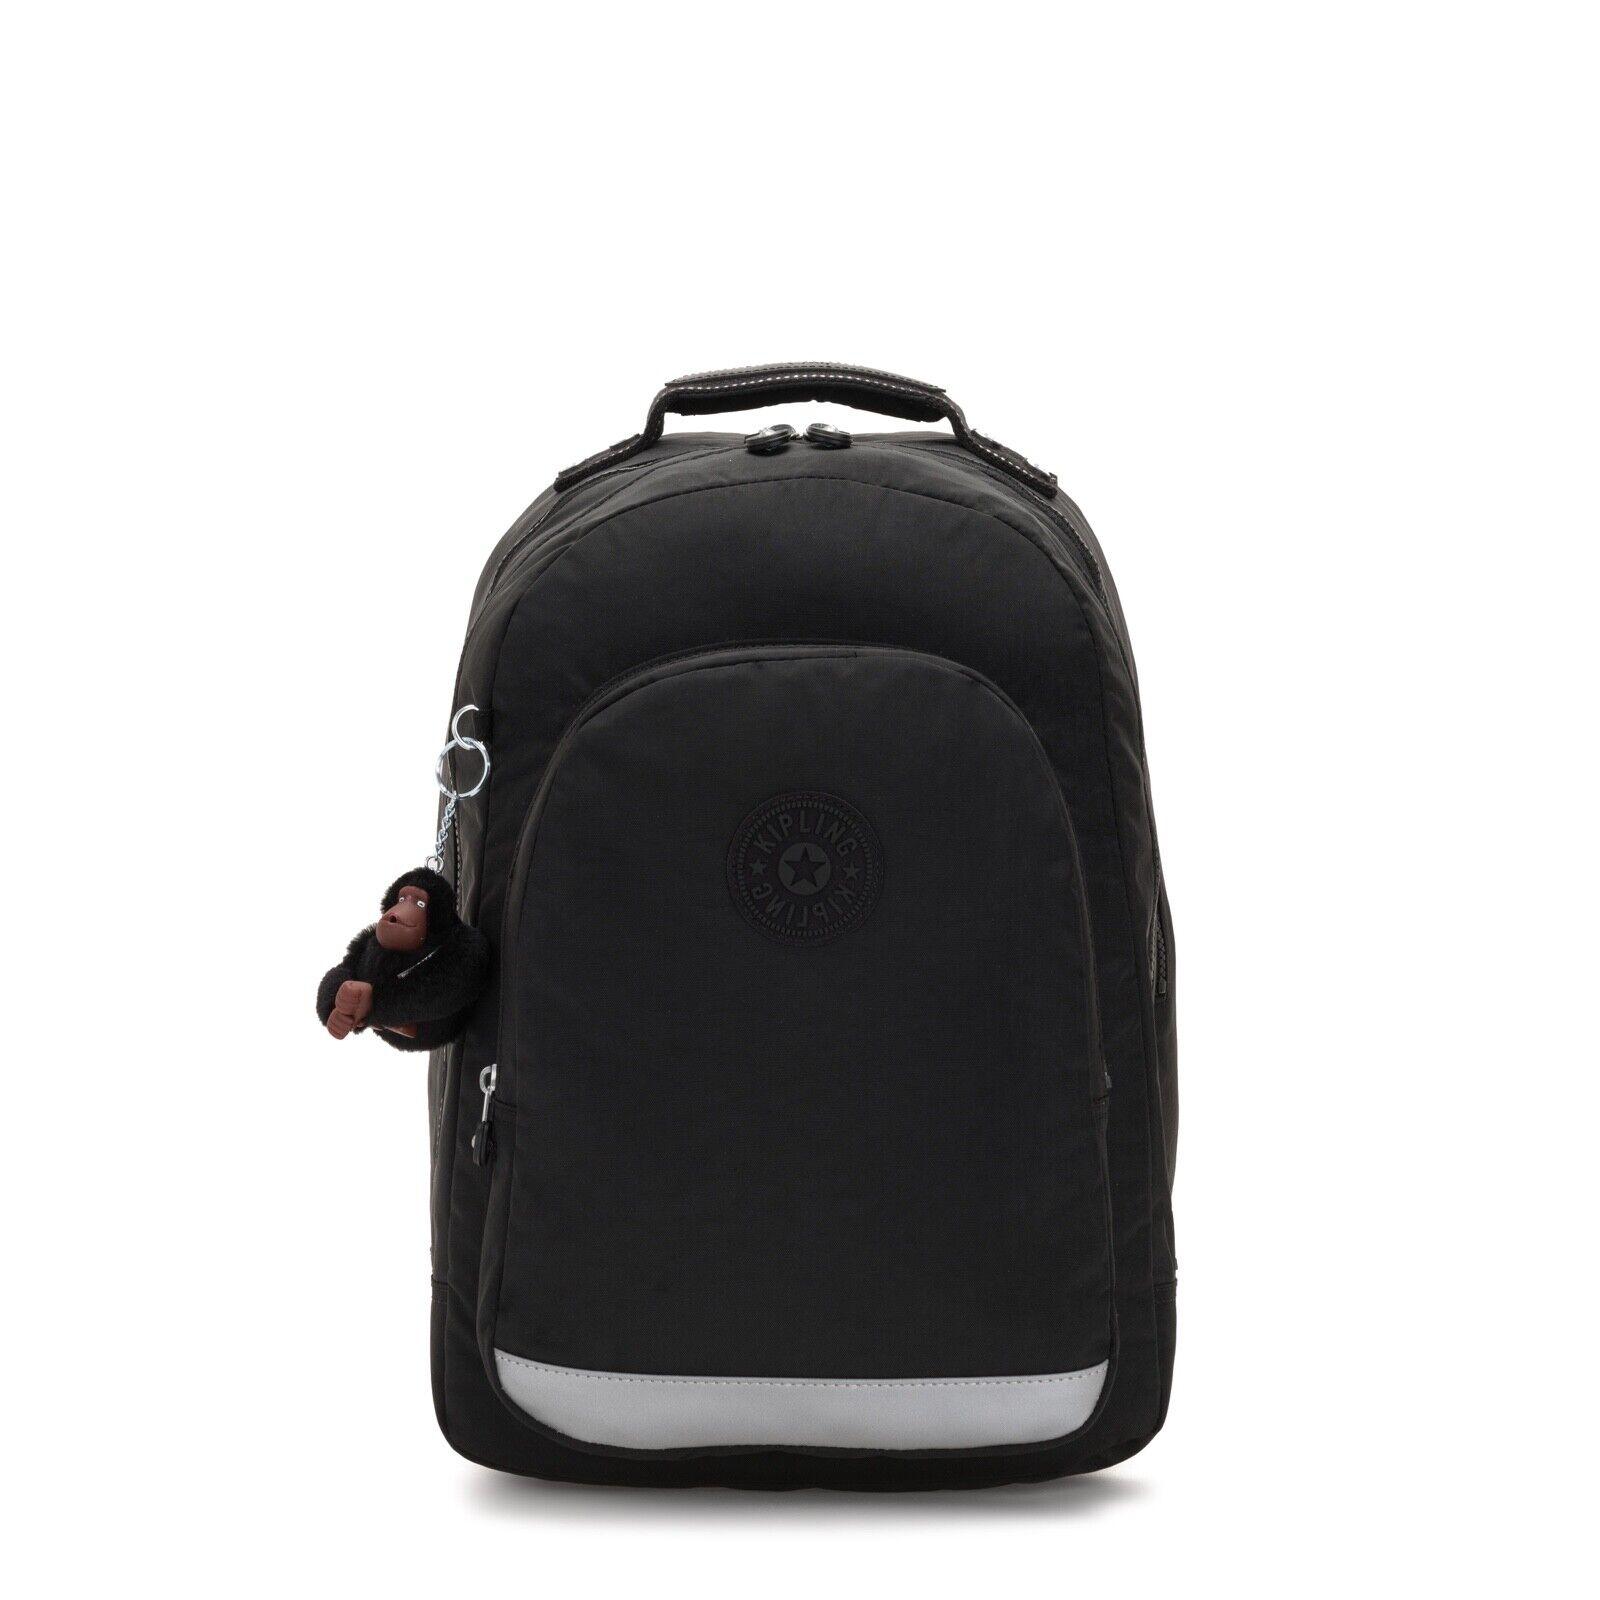 Kipling classee Stanza Gree Zaino Laptop Prossoezione Vero Nero BTS19 RRP £126